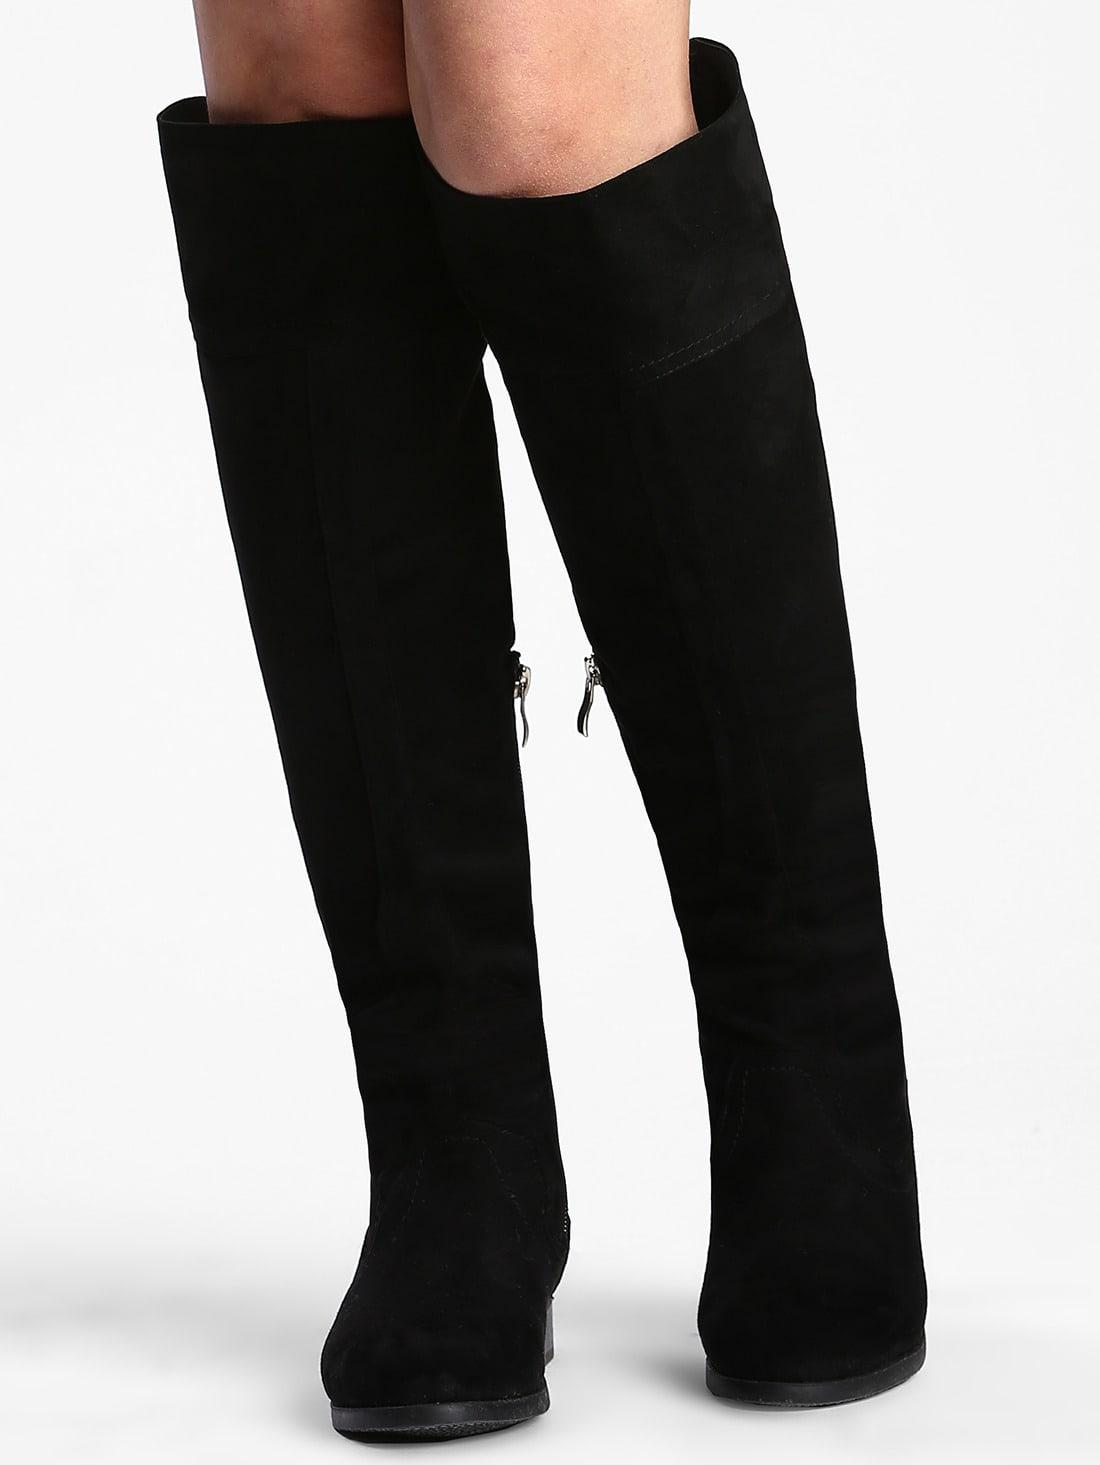 Black Tassel Suede High Boots - $25.89